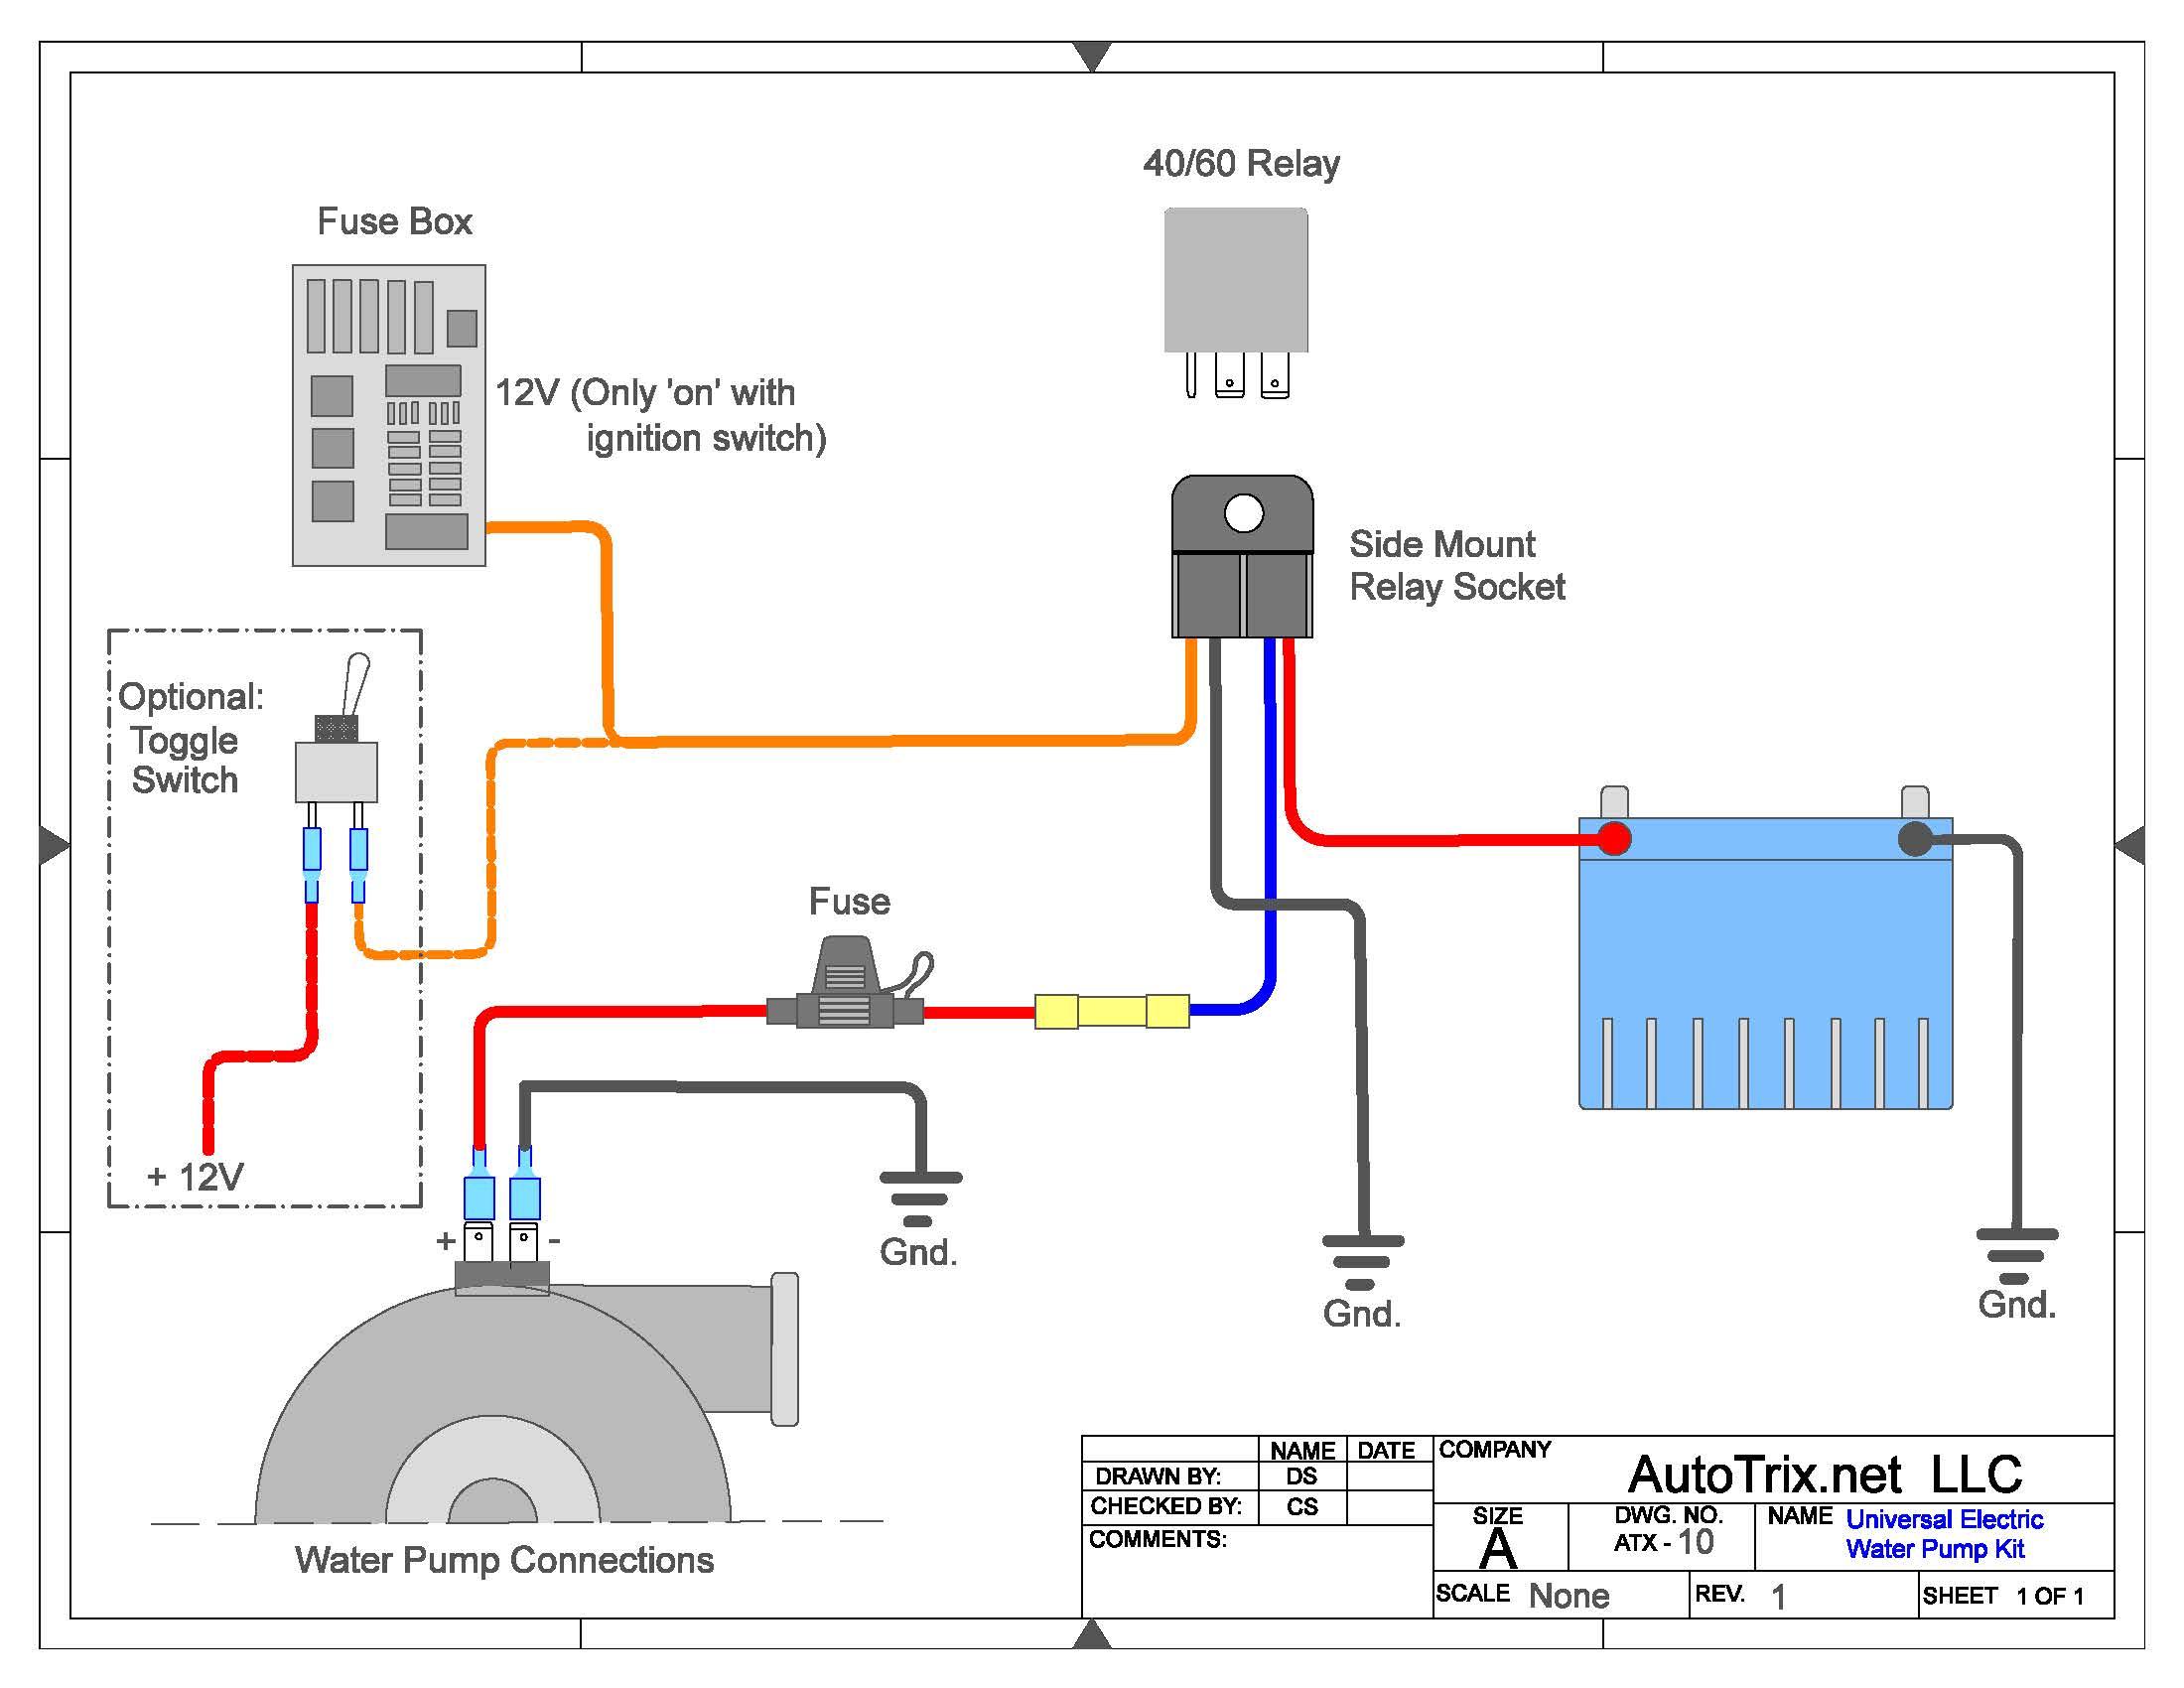 Universal Electric Water Pump Relay Kit